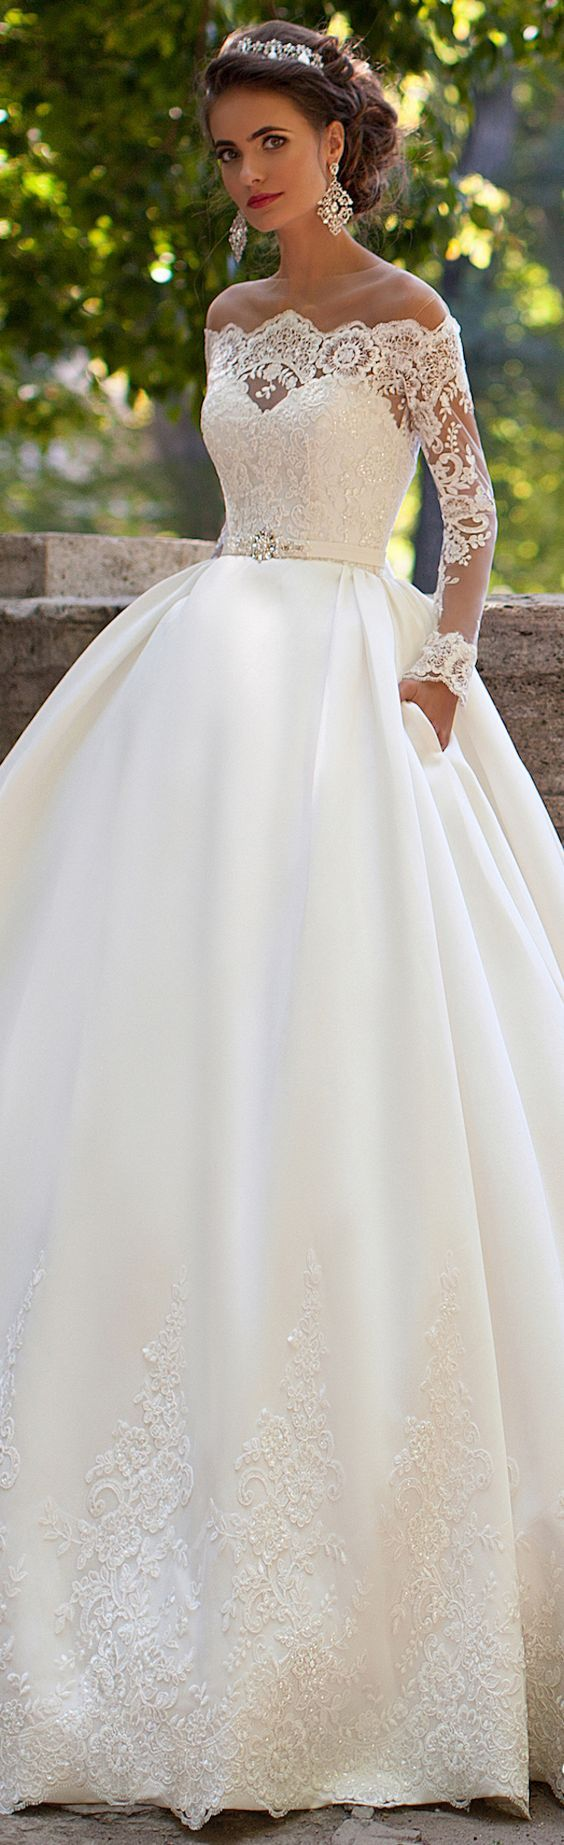 sleeve wedding dresses wedding dresses with sleeves Stunning Long Sleeve Wedding Dresses